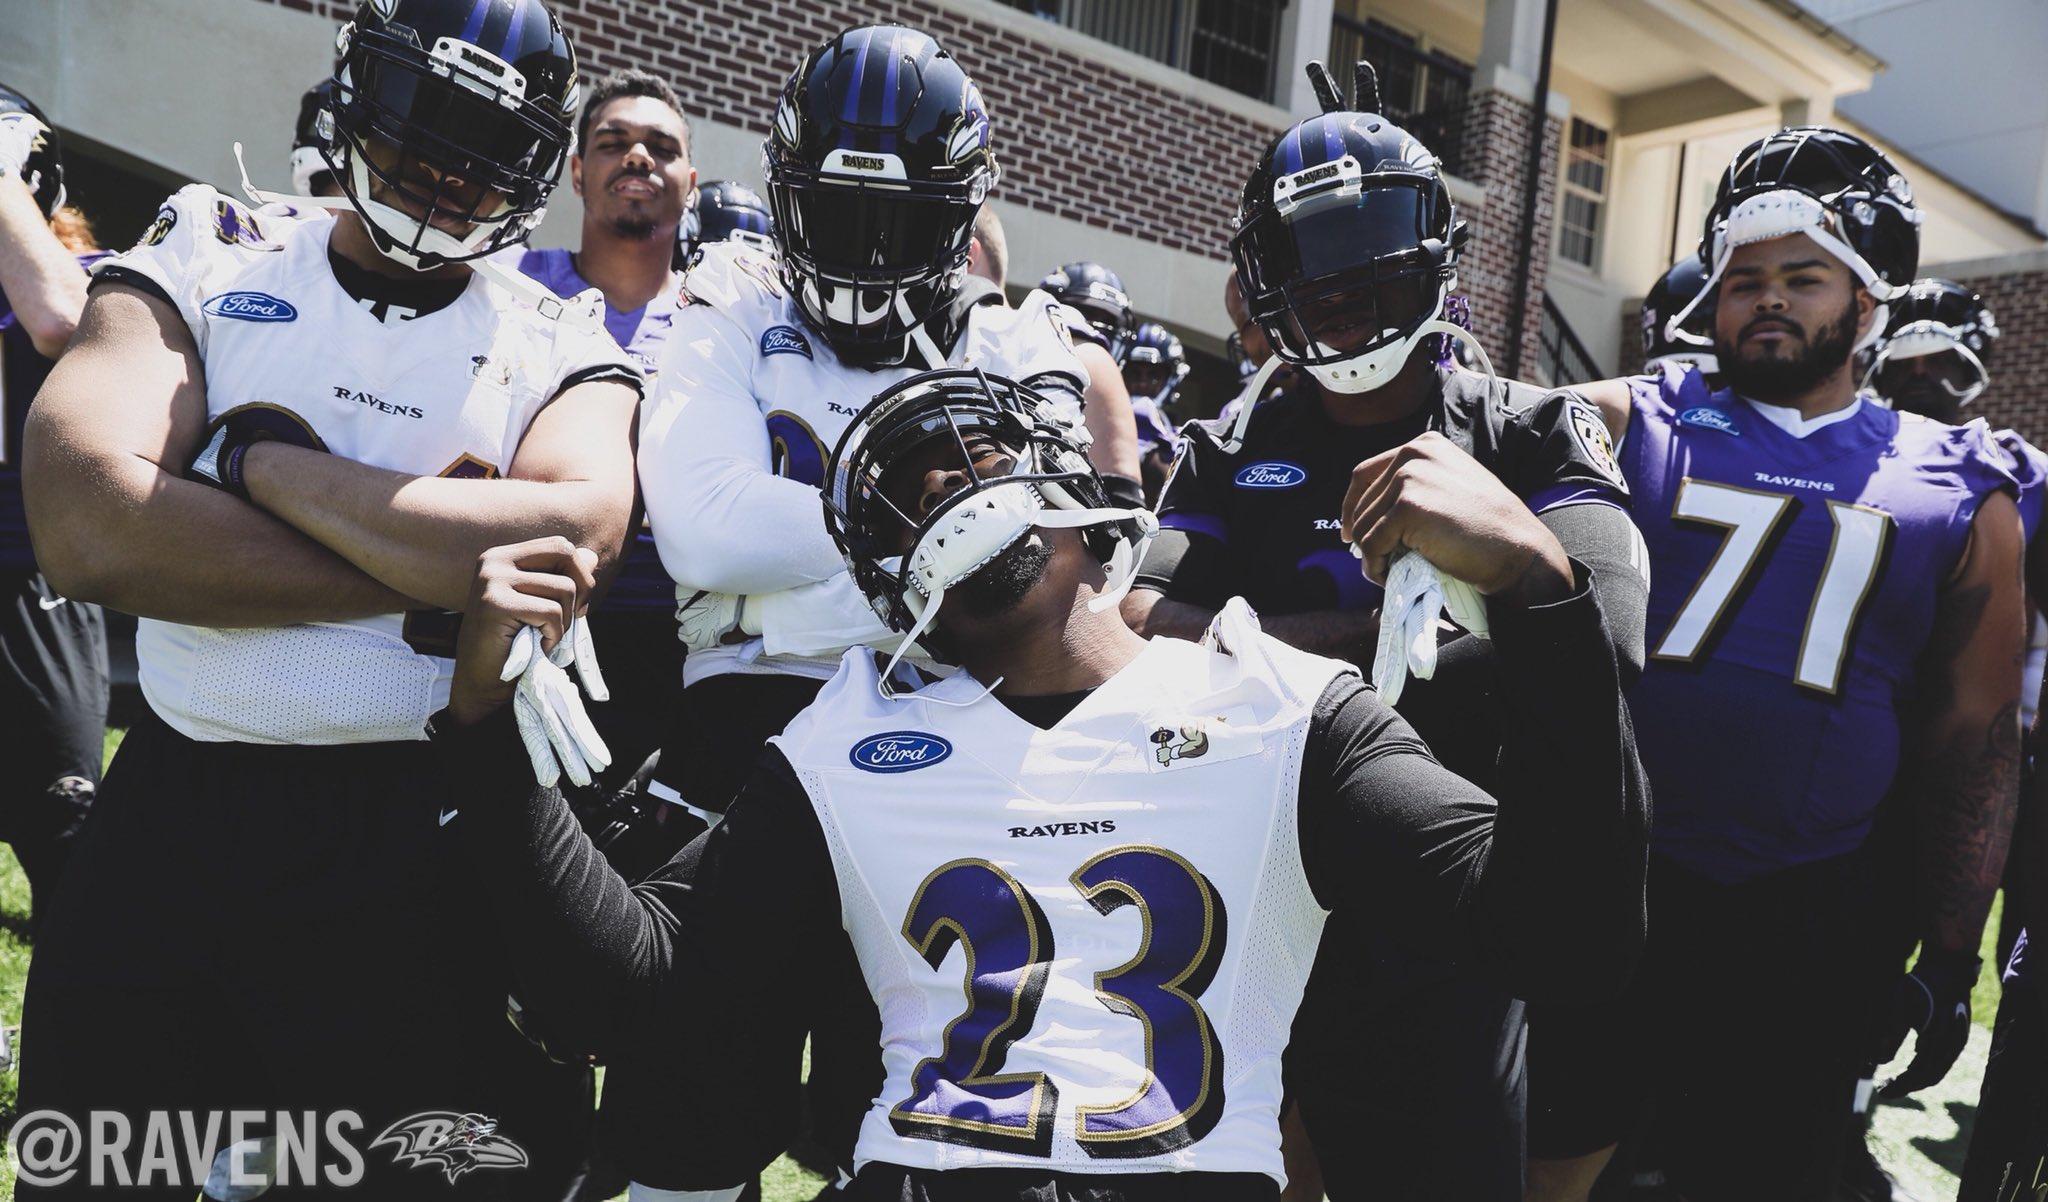 Nobody fresher #RavensFlock https://t.co/pJAlEu5hJg